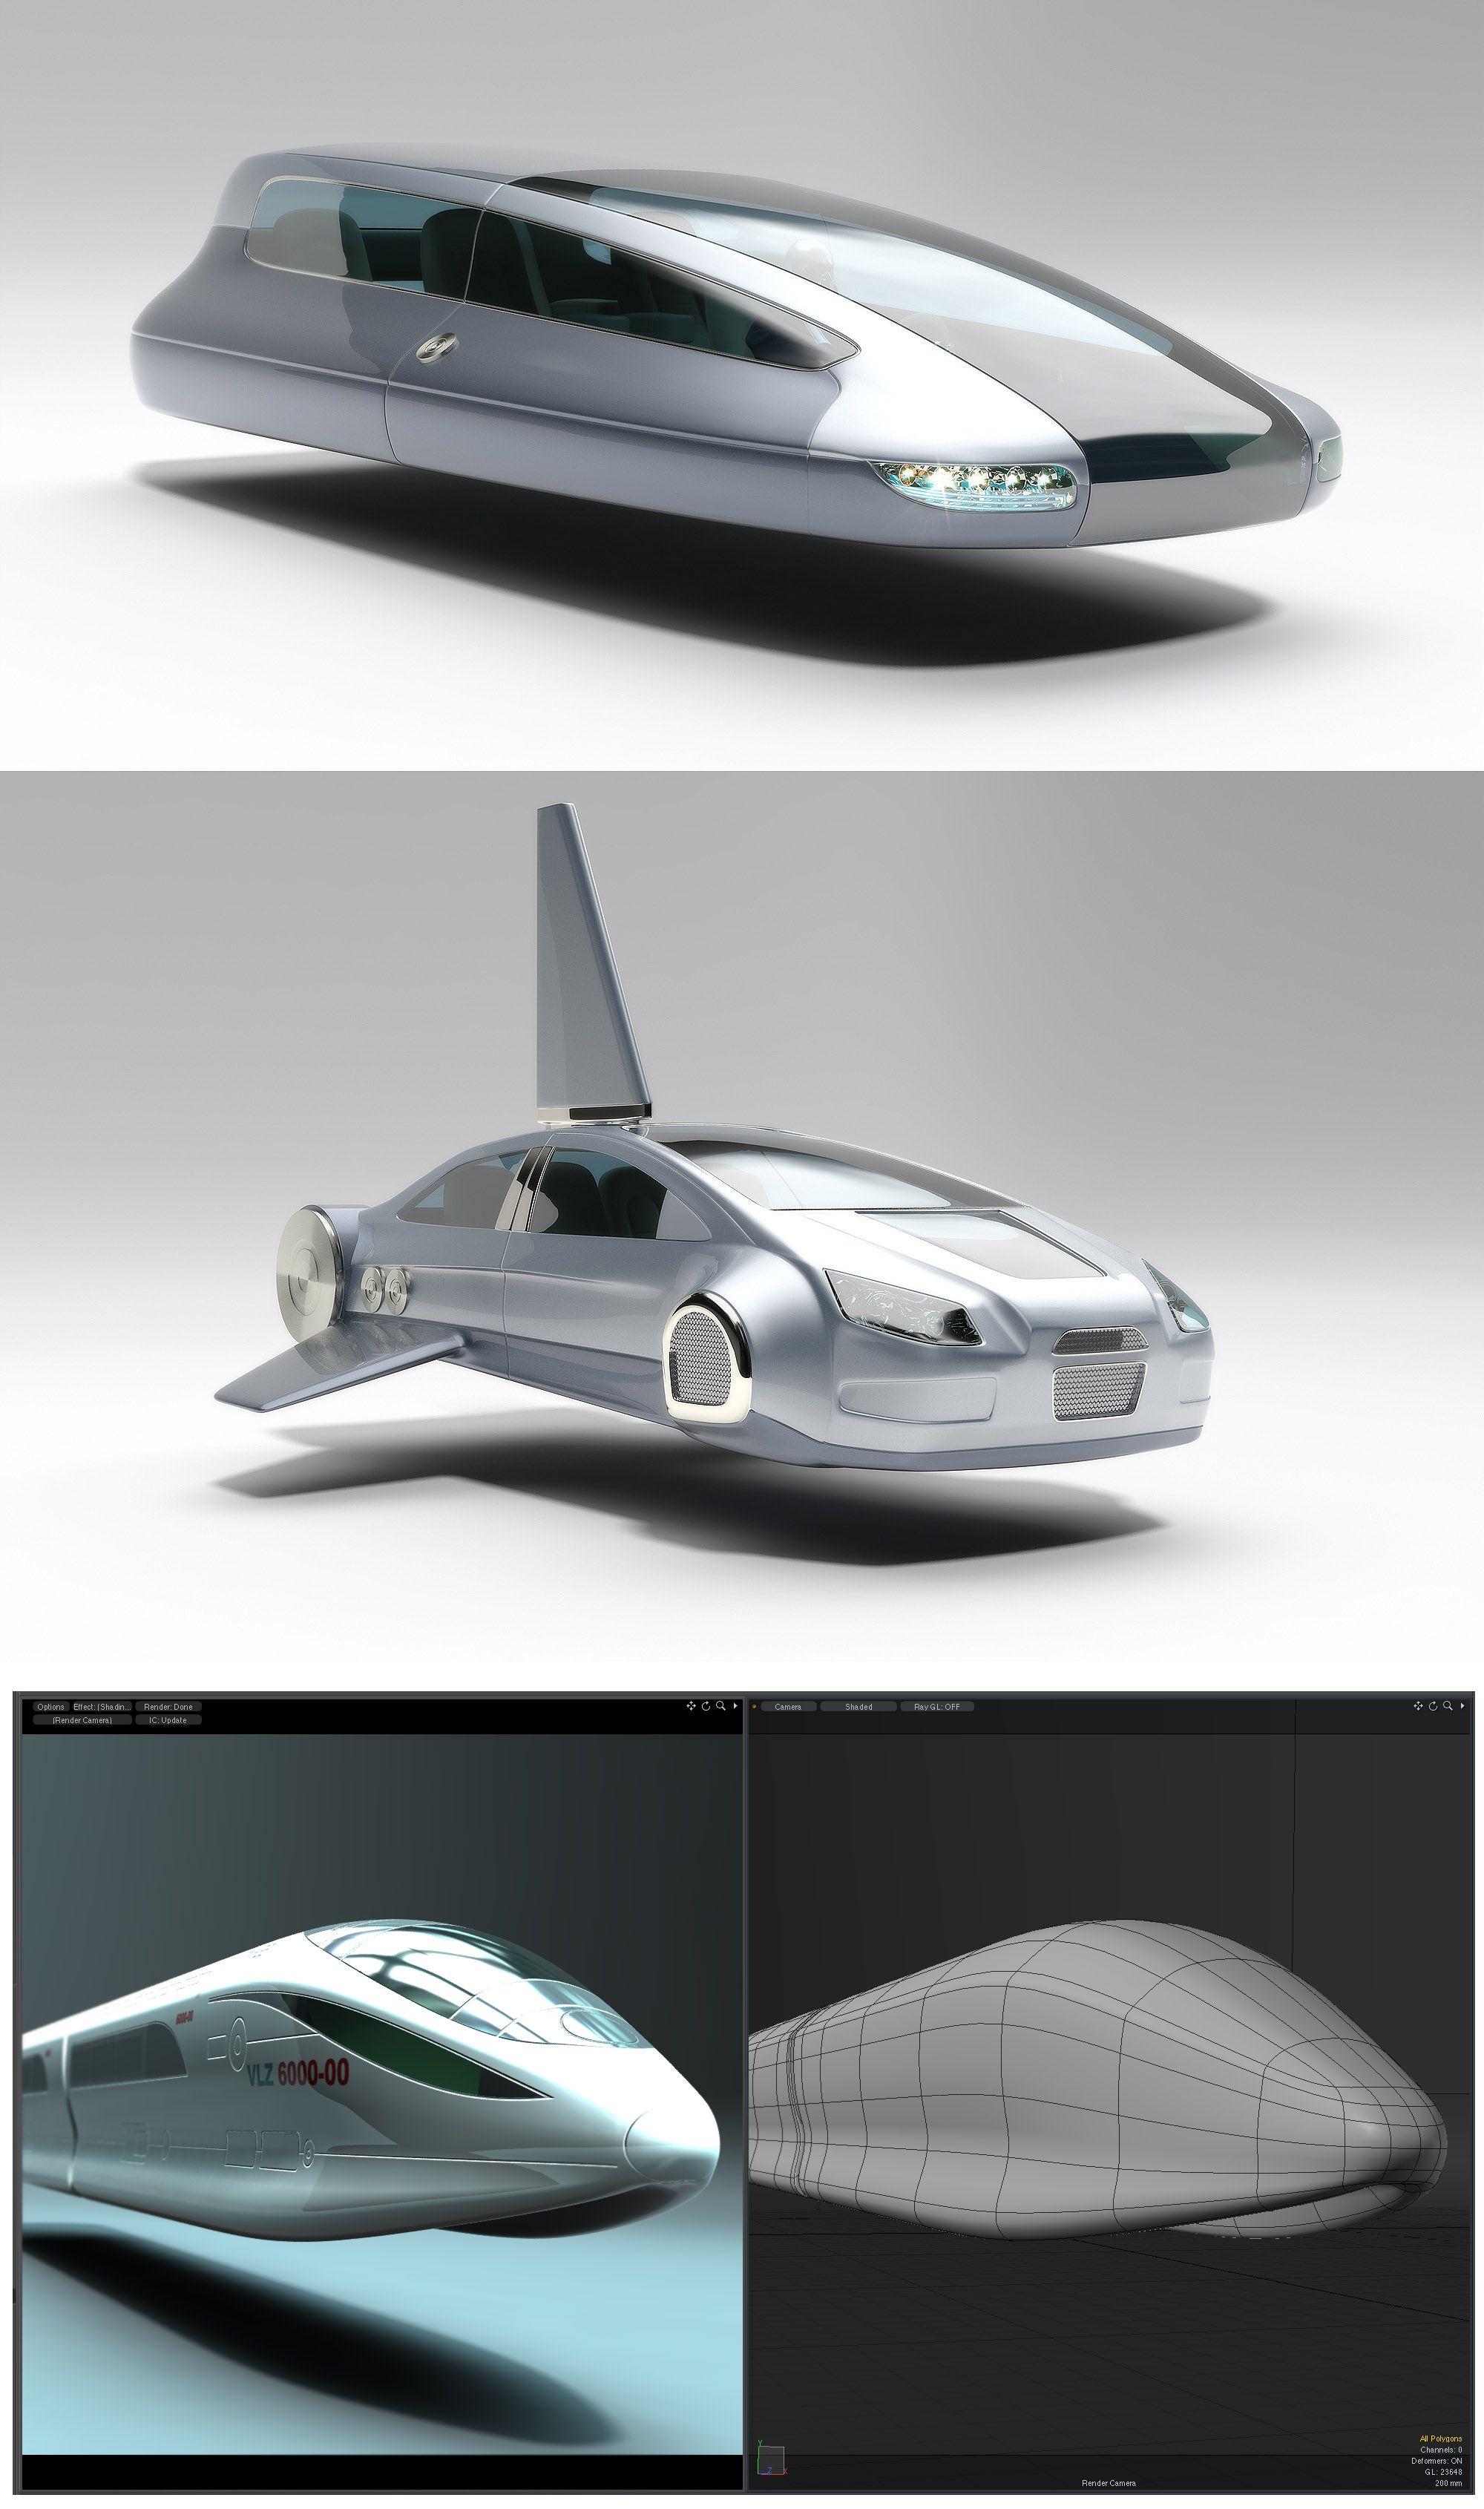 futuristic vehicles ΠΩΛΗΣΕΙΣ ΕΠΙΧΕΙΡΗΣΕΩΝ